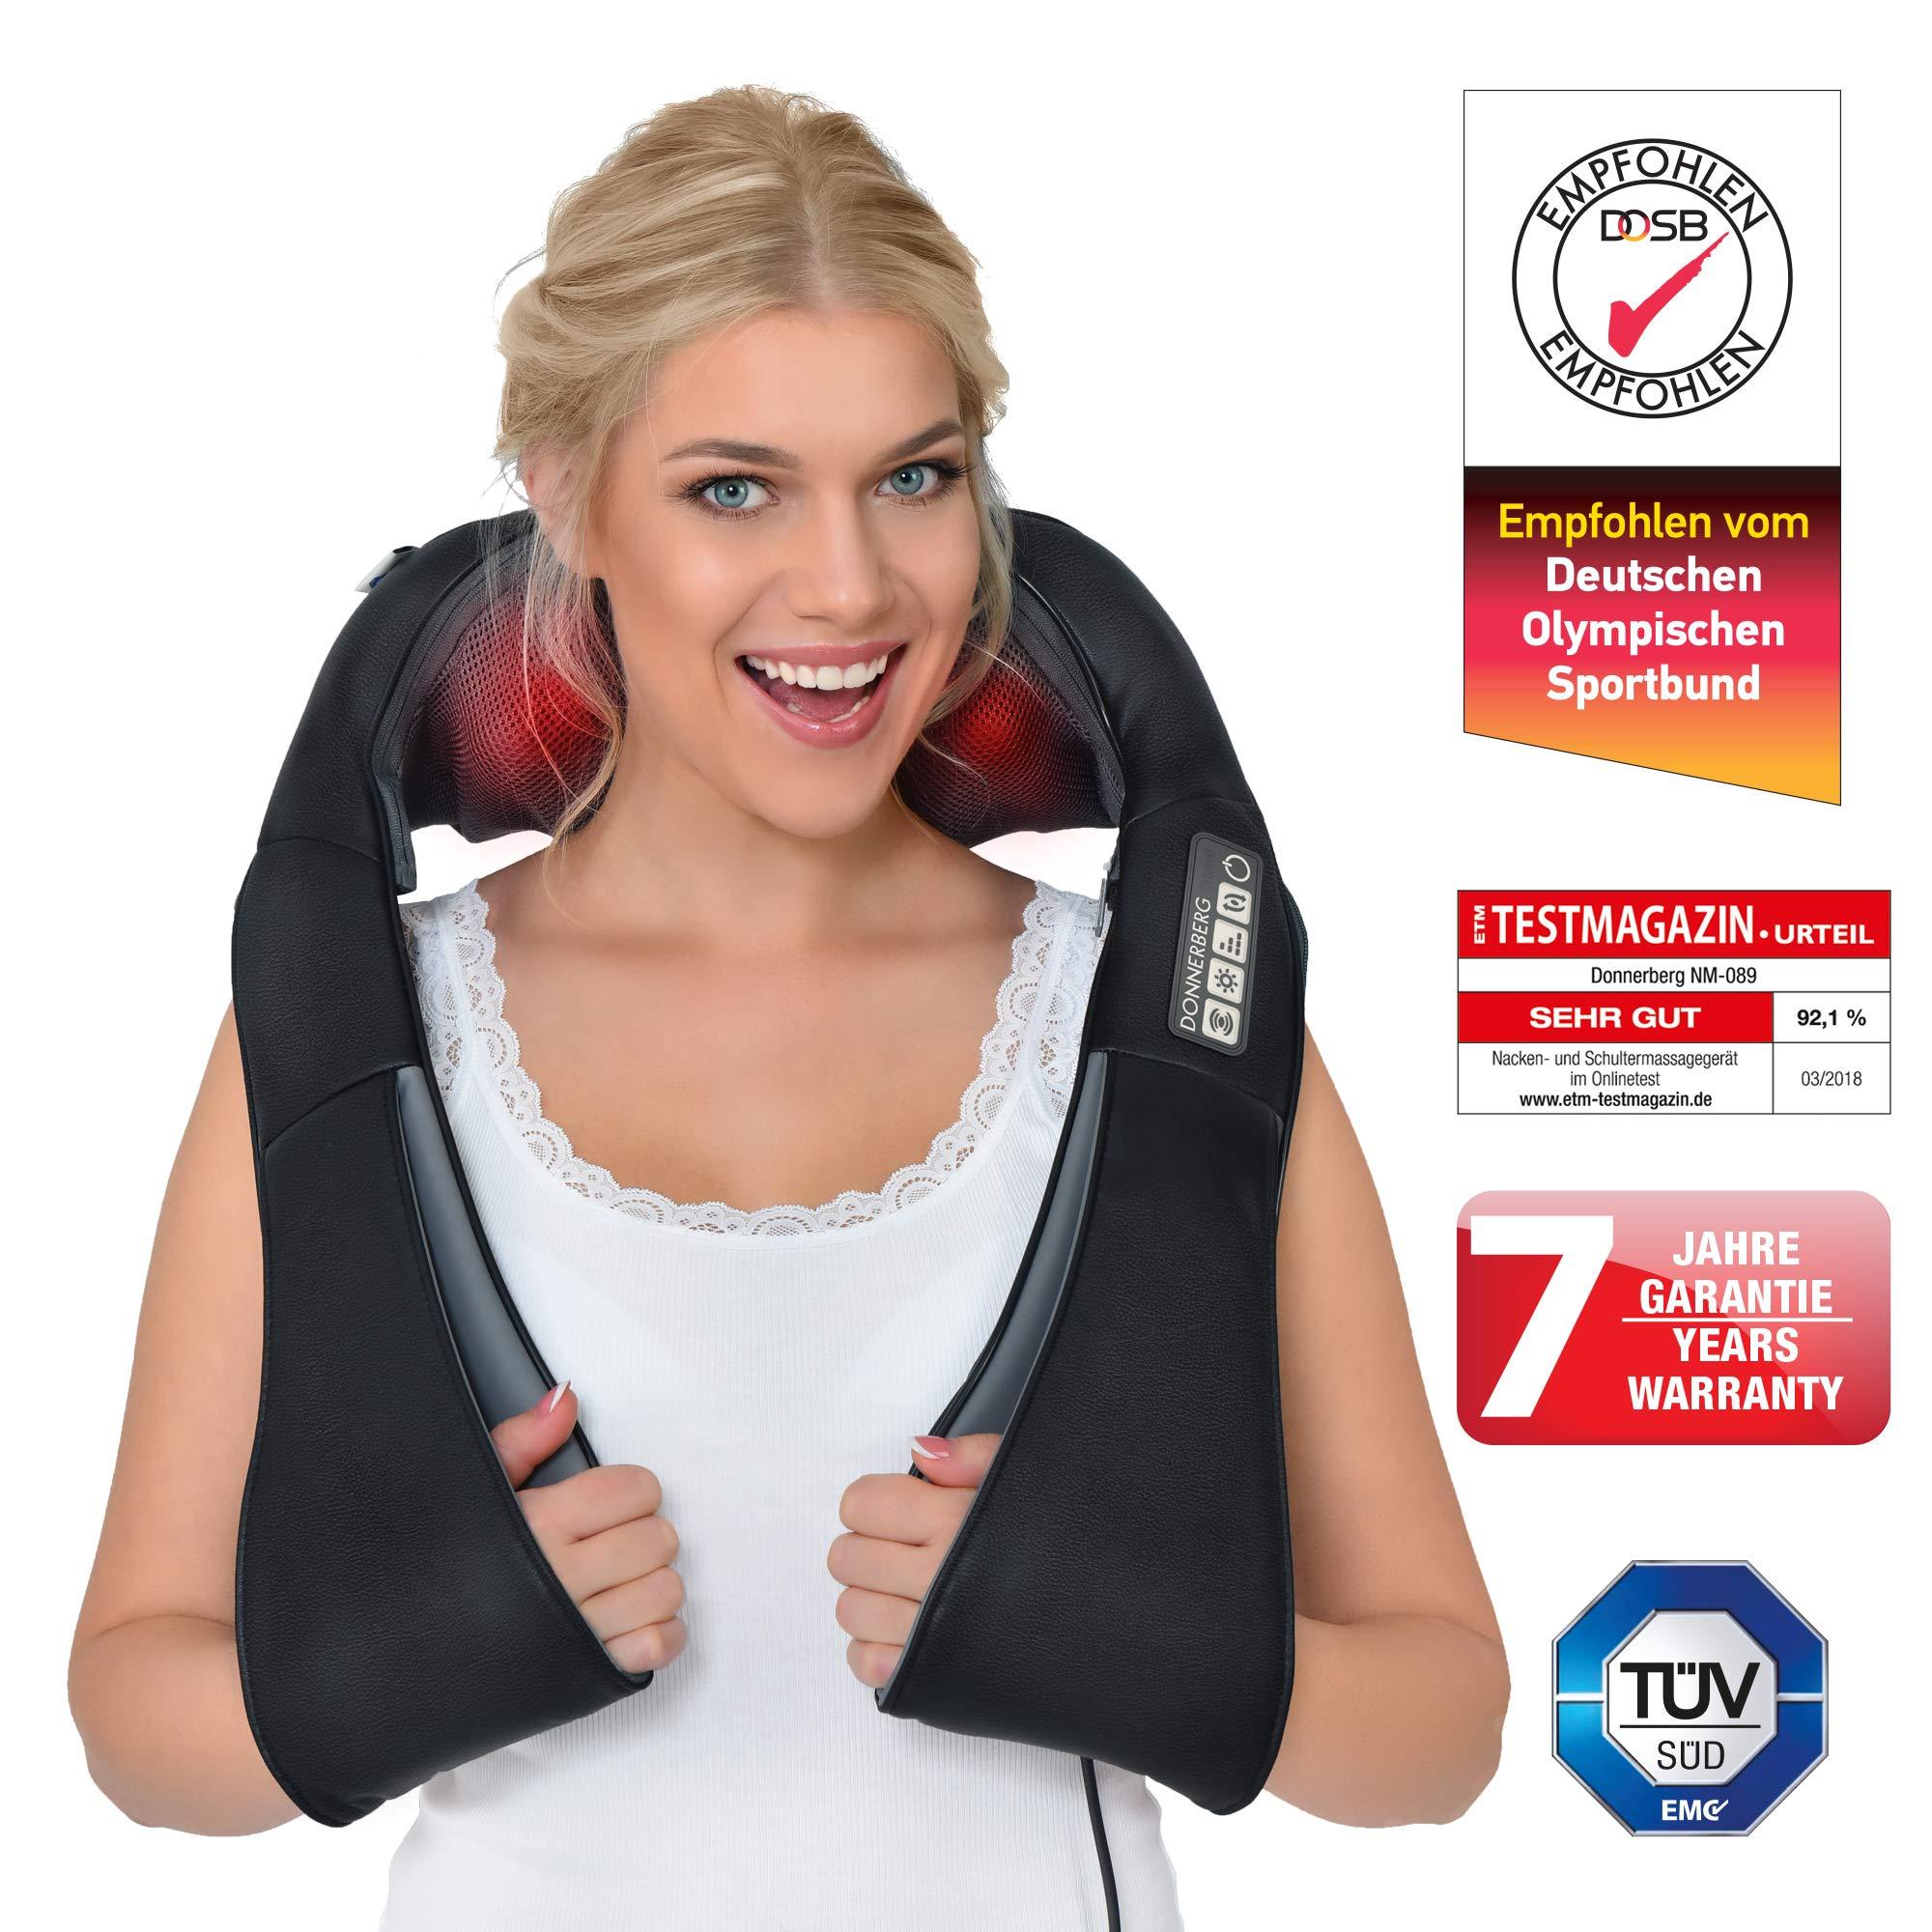 Donnerberg® DAS ORIGINAL Nackenmassagegerät mit Wärme | Schulter Massagegerät für Nacken Schulter Rücken | Muskel Schmerzen | 3D-Rotation Massage | TÜV | 7 Jahre Garantie | Haus Büro Auto product image